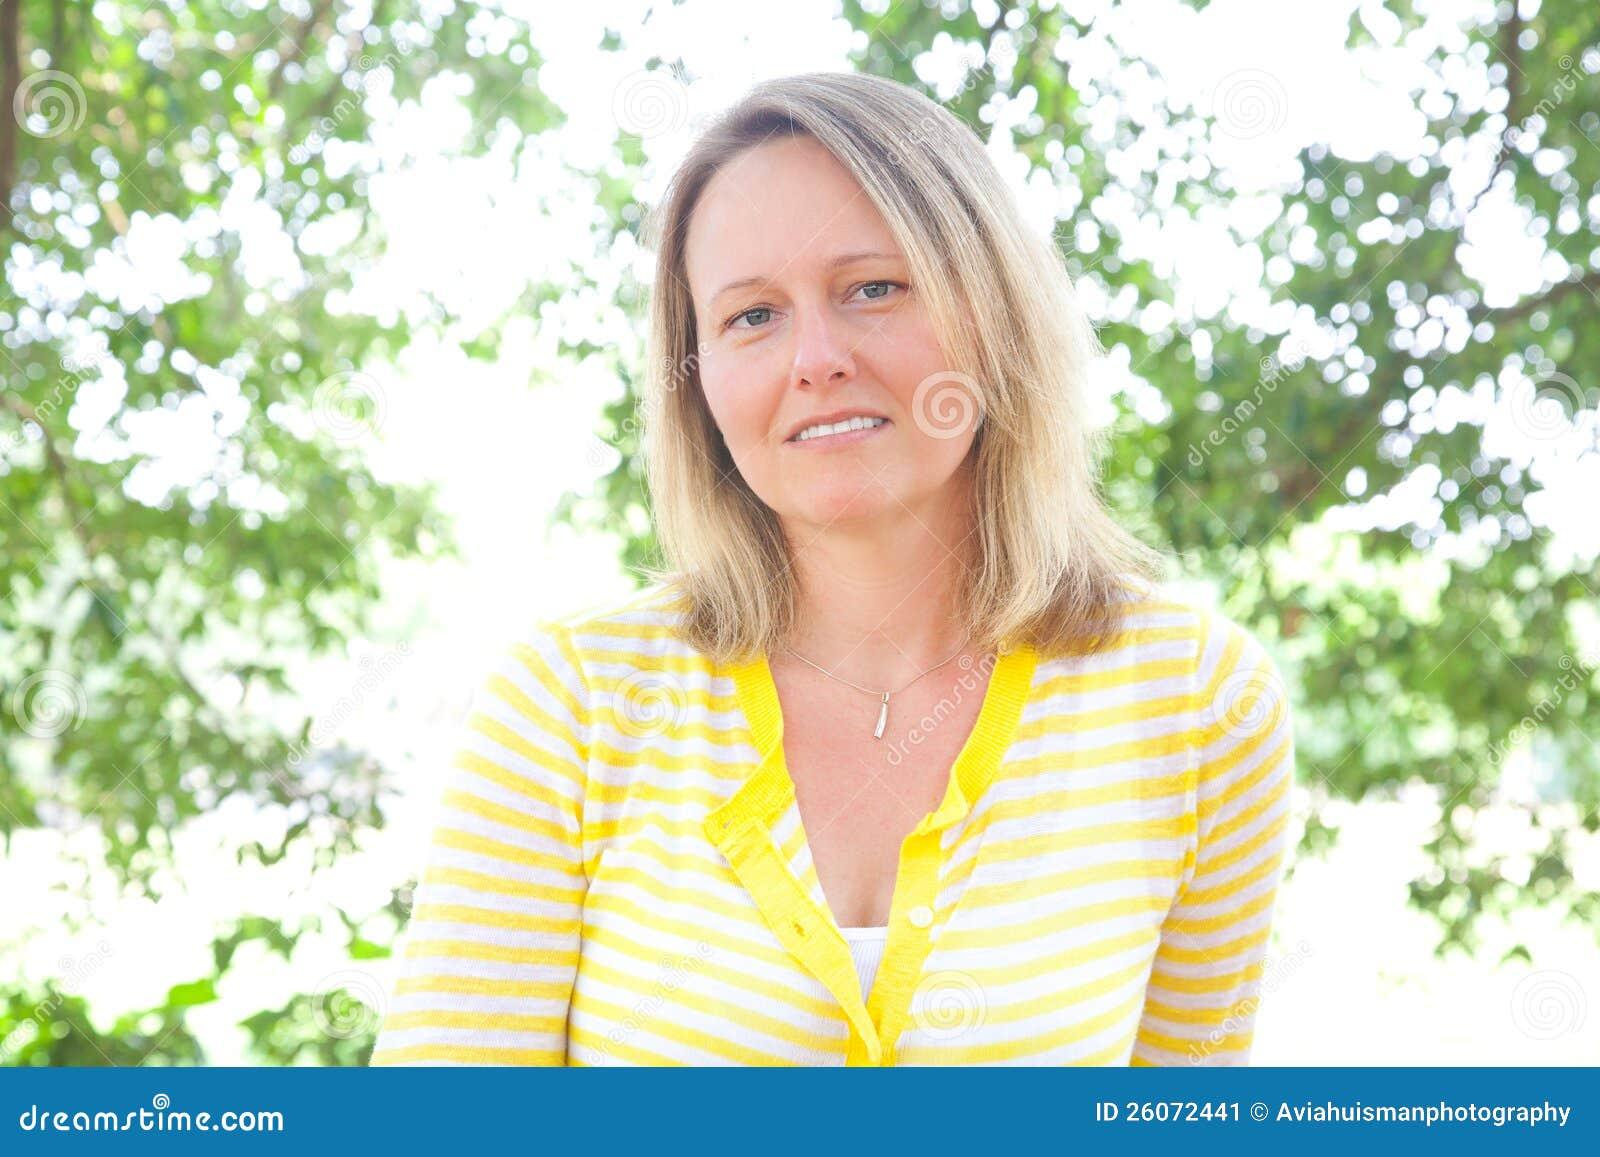 Cute Woman Yellow Sweater Outdoors